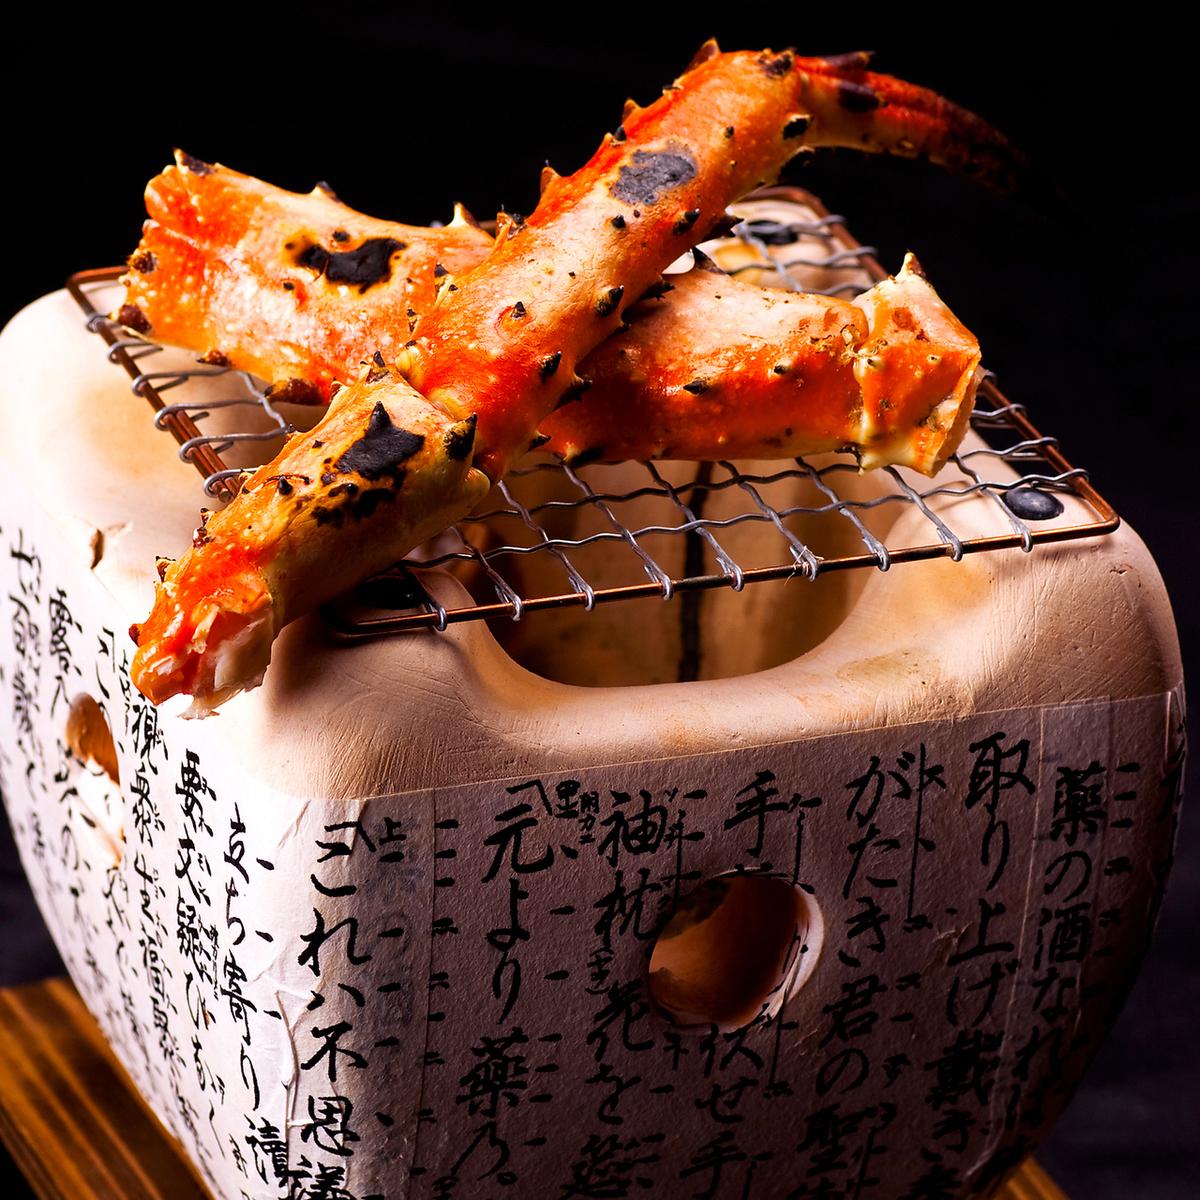 Seasonal seafood in the season baked with desktop shrimp